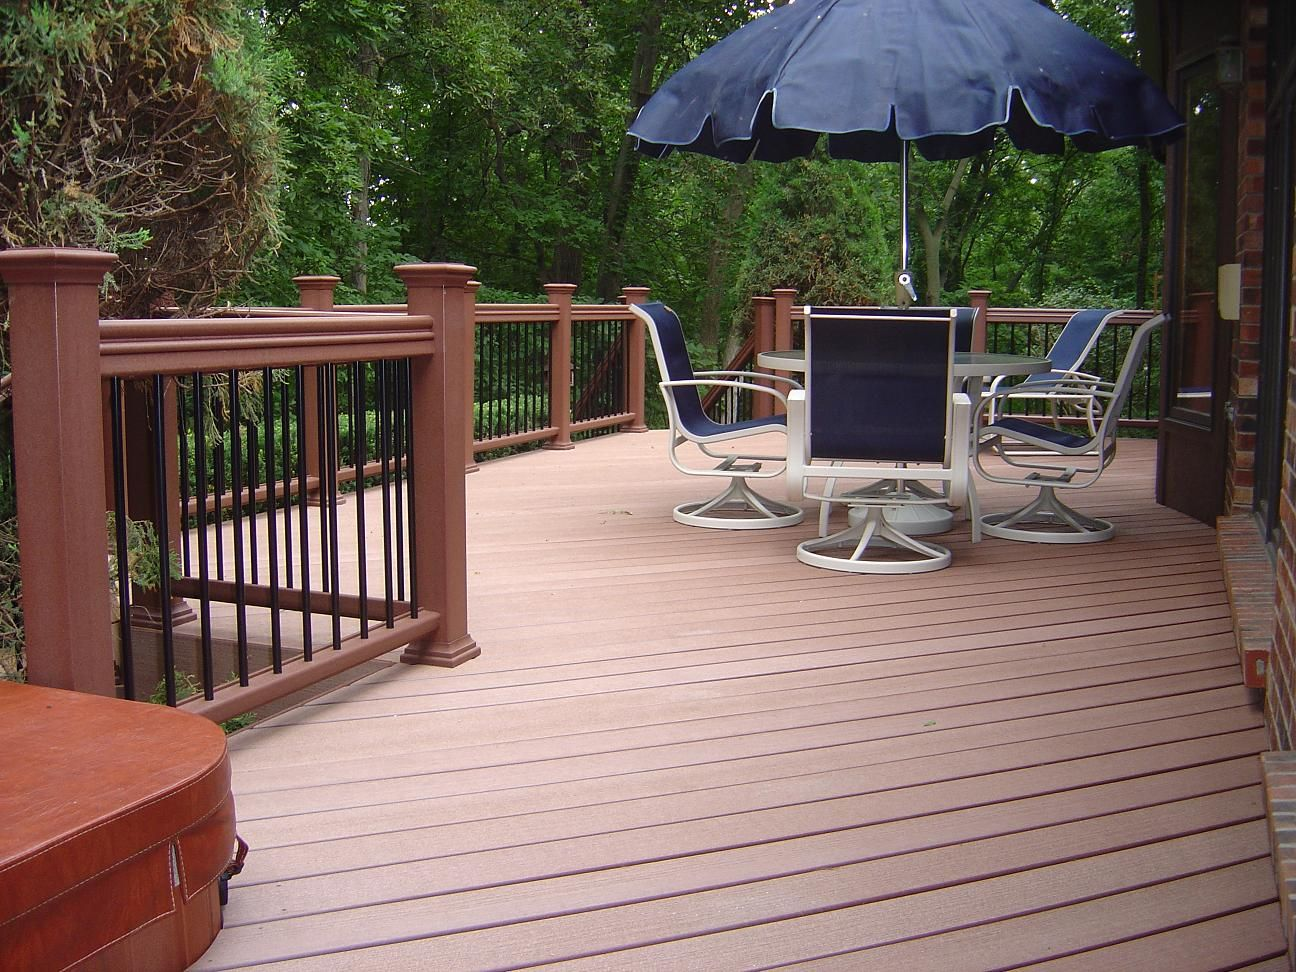 best waterproof material for balcony floor, recycle wood